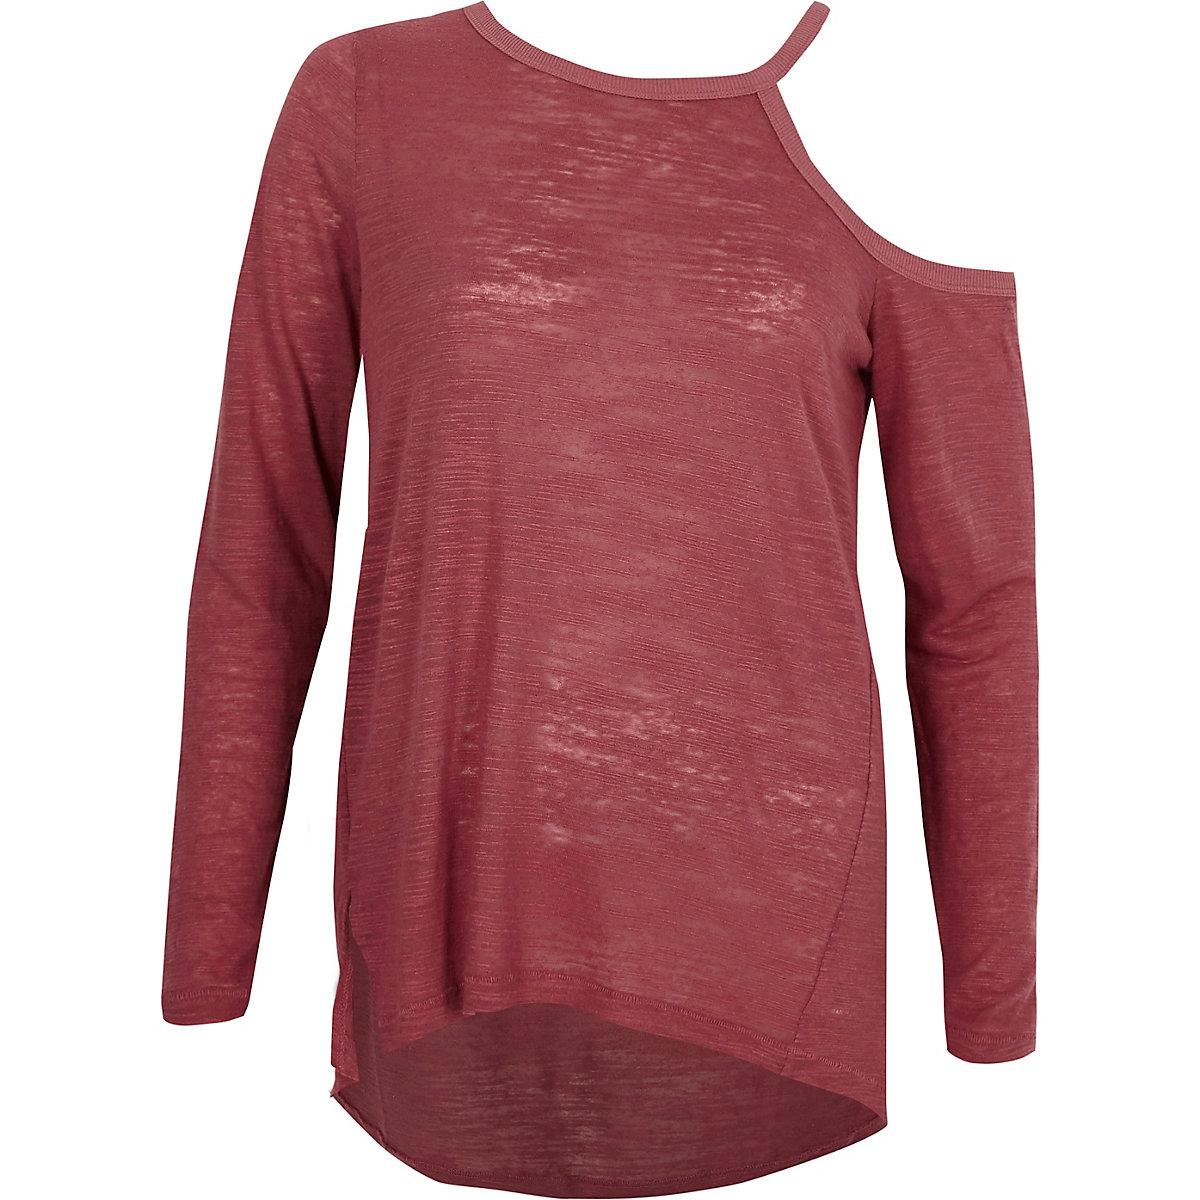 Pink long sleeve one shoulder T-shirt